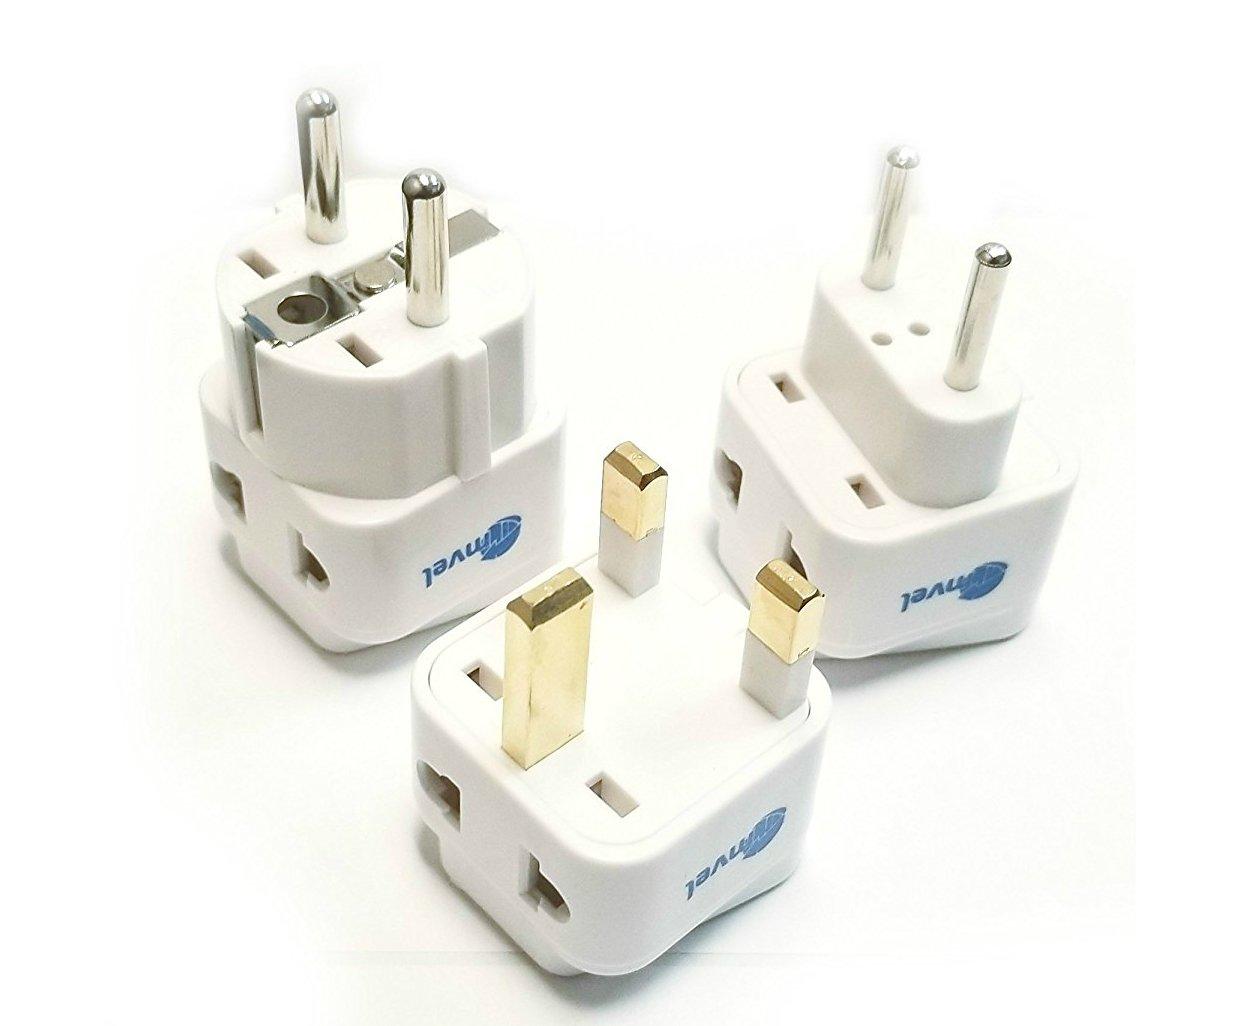 Euro Travel Plug Adapter Set - European, Finland, UK, Turkey, Spain, Saudi Arabia, Russia, Hong Kong, Italy and More